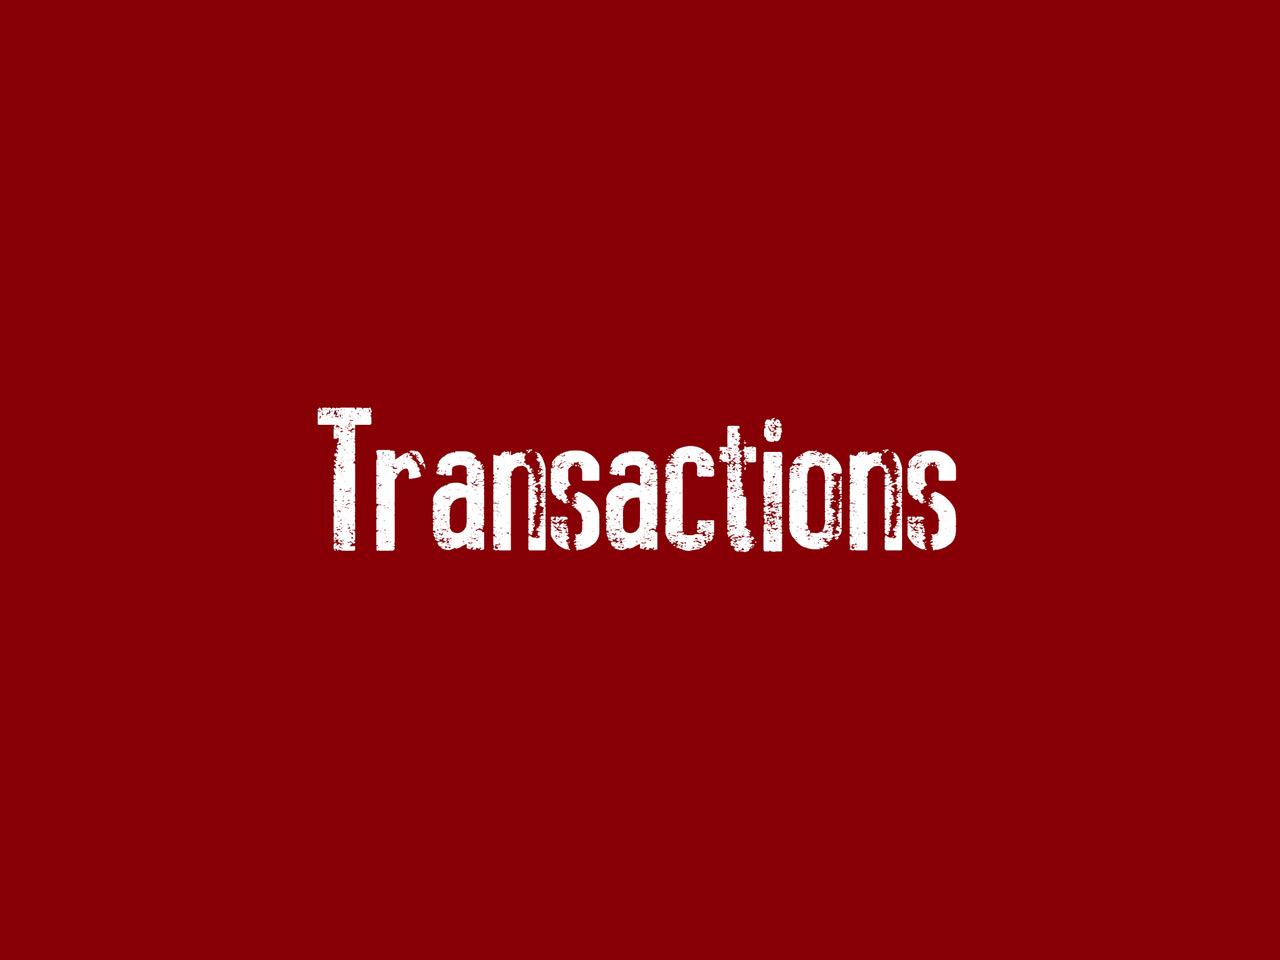 Transactions.jpeg